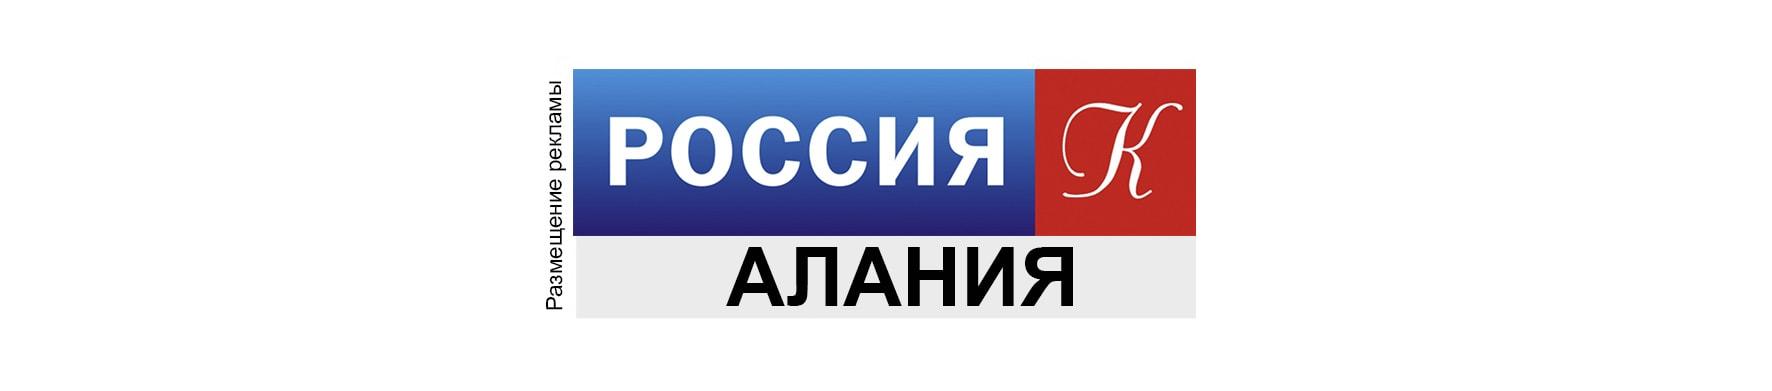 Реклама на телевидении в РСО-Алания Россия К